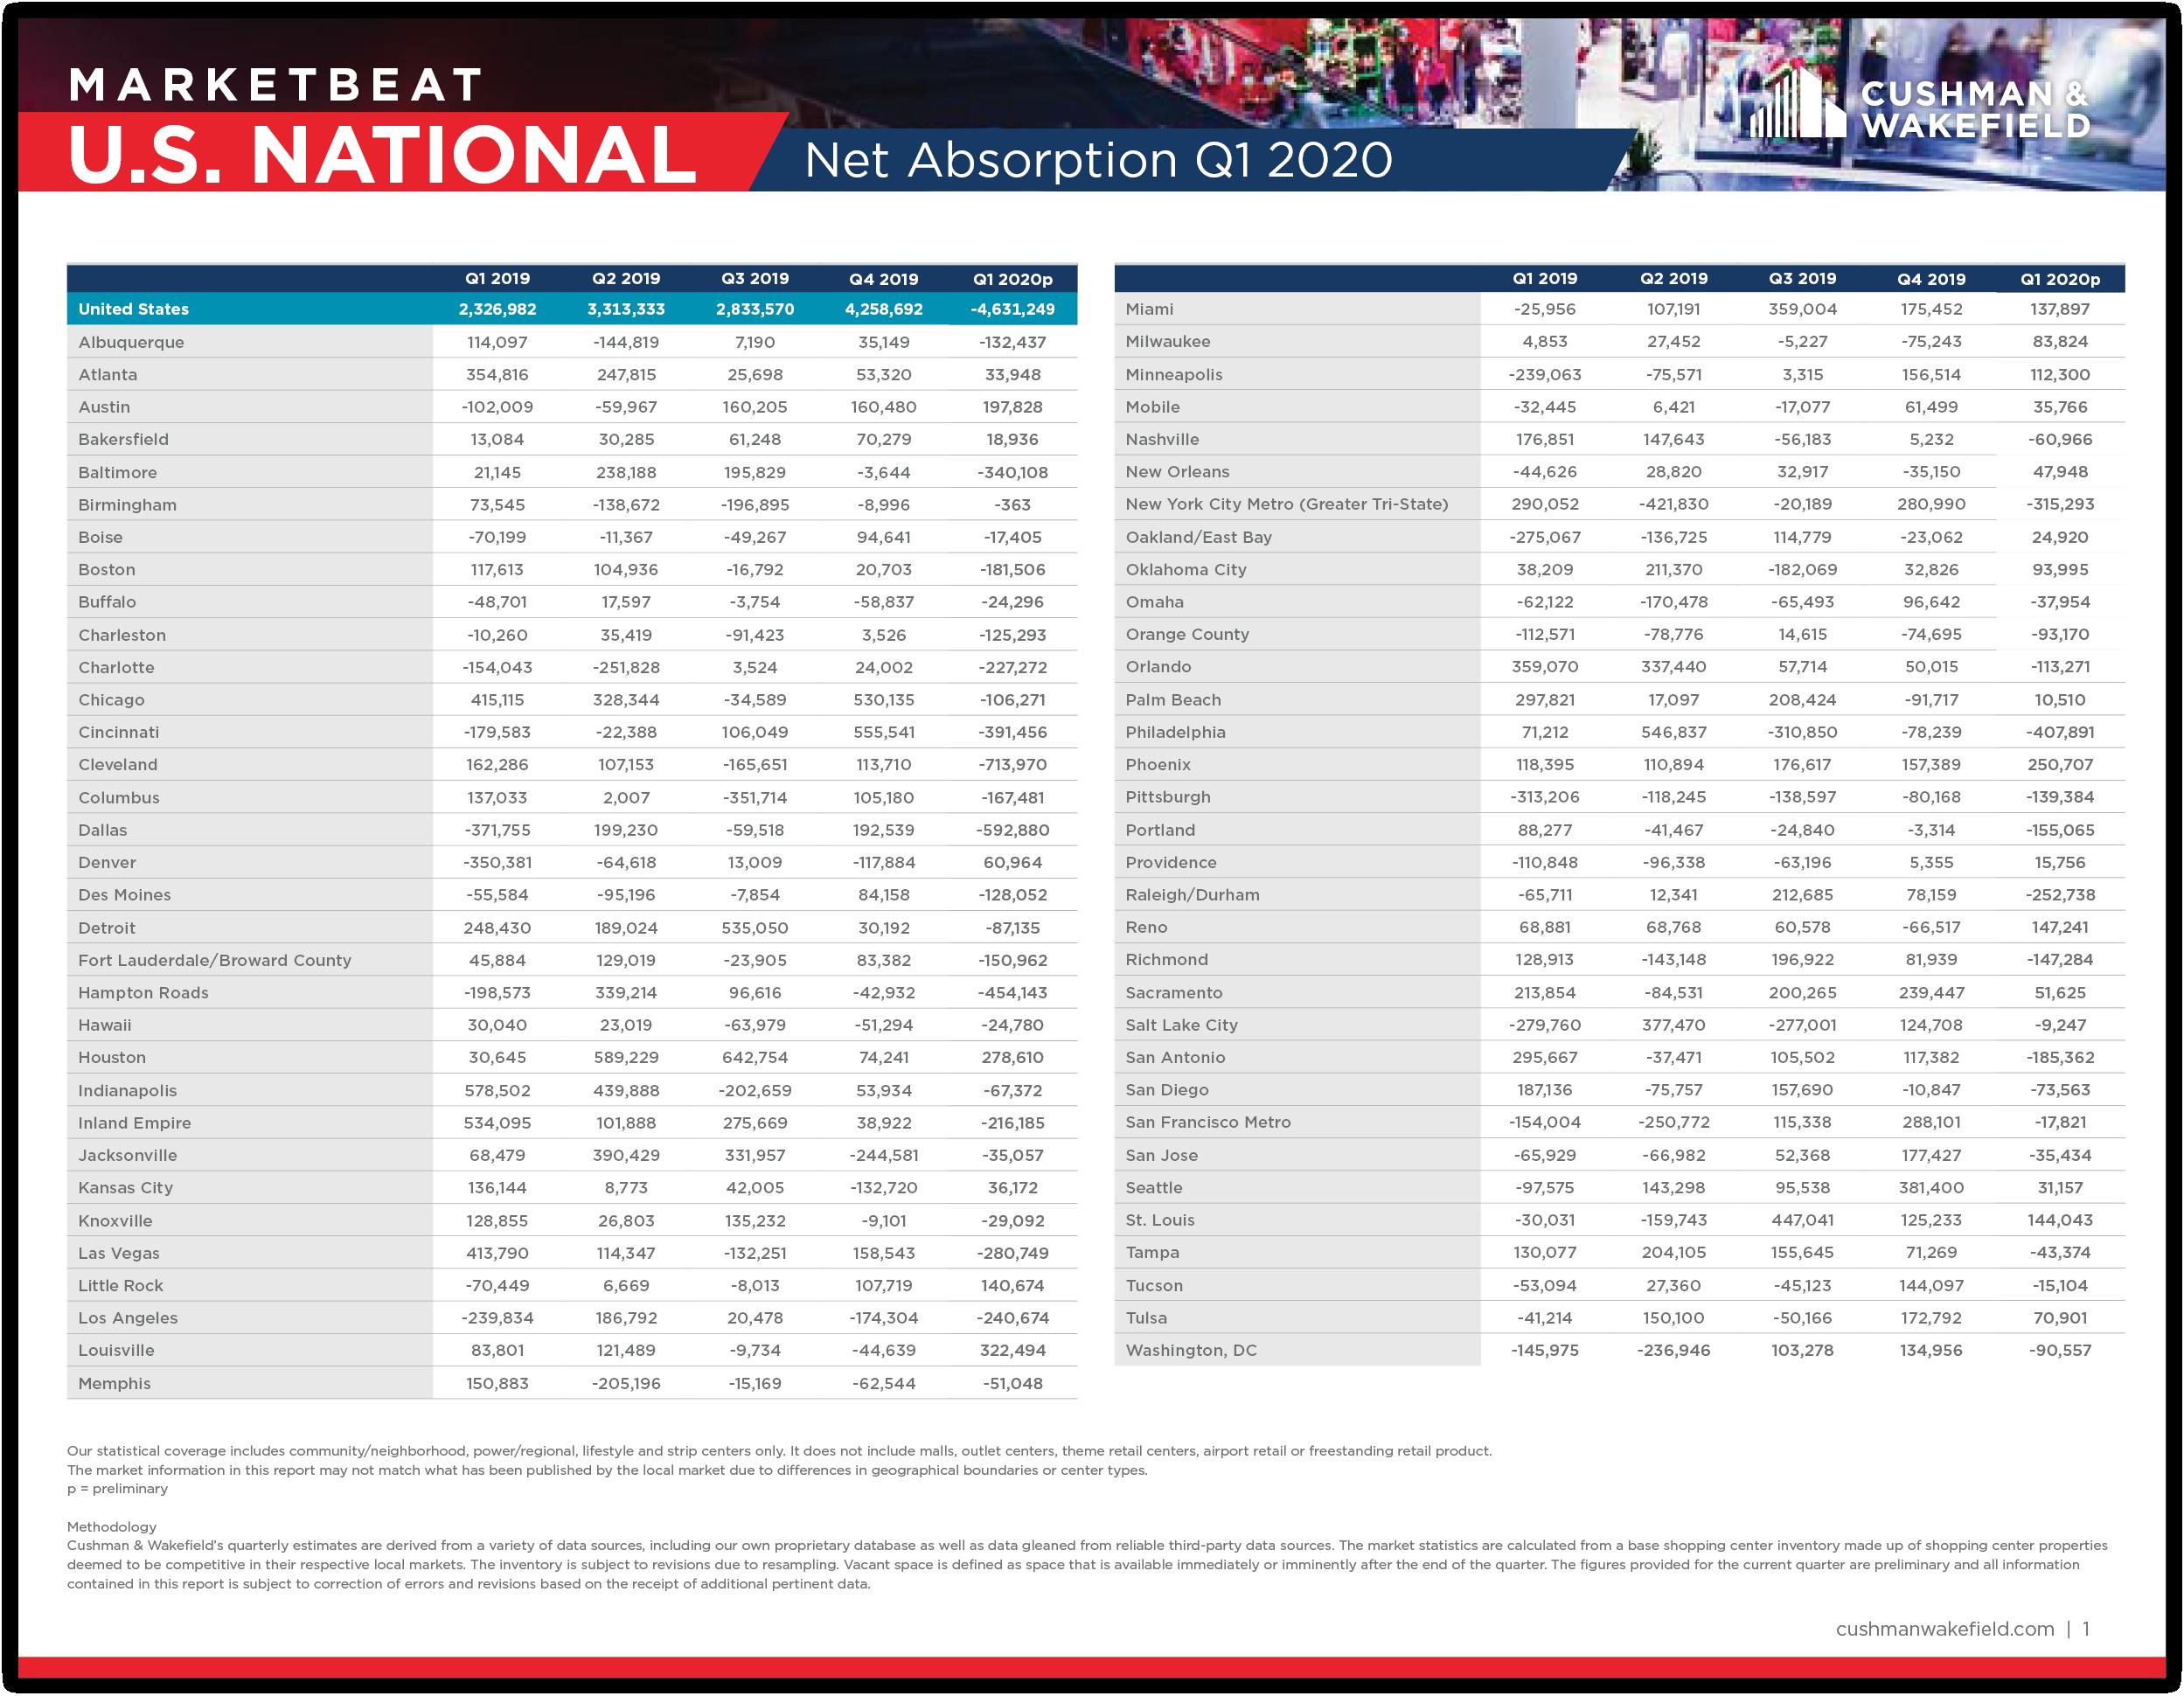 US Retail MarketBeat Report